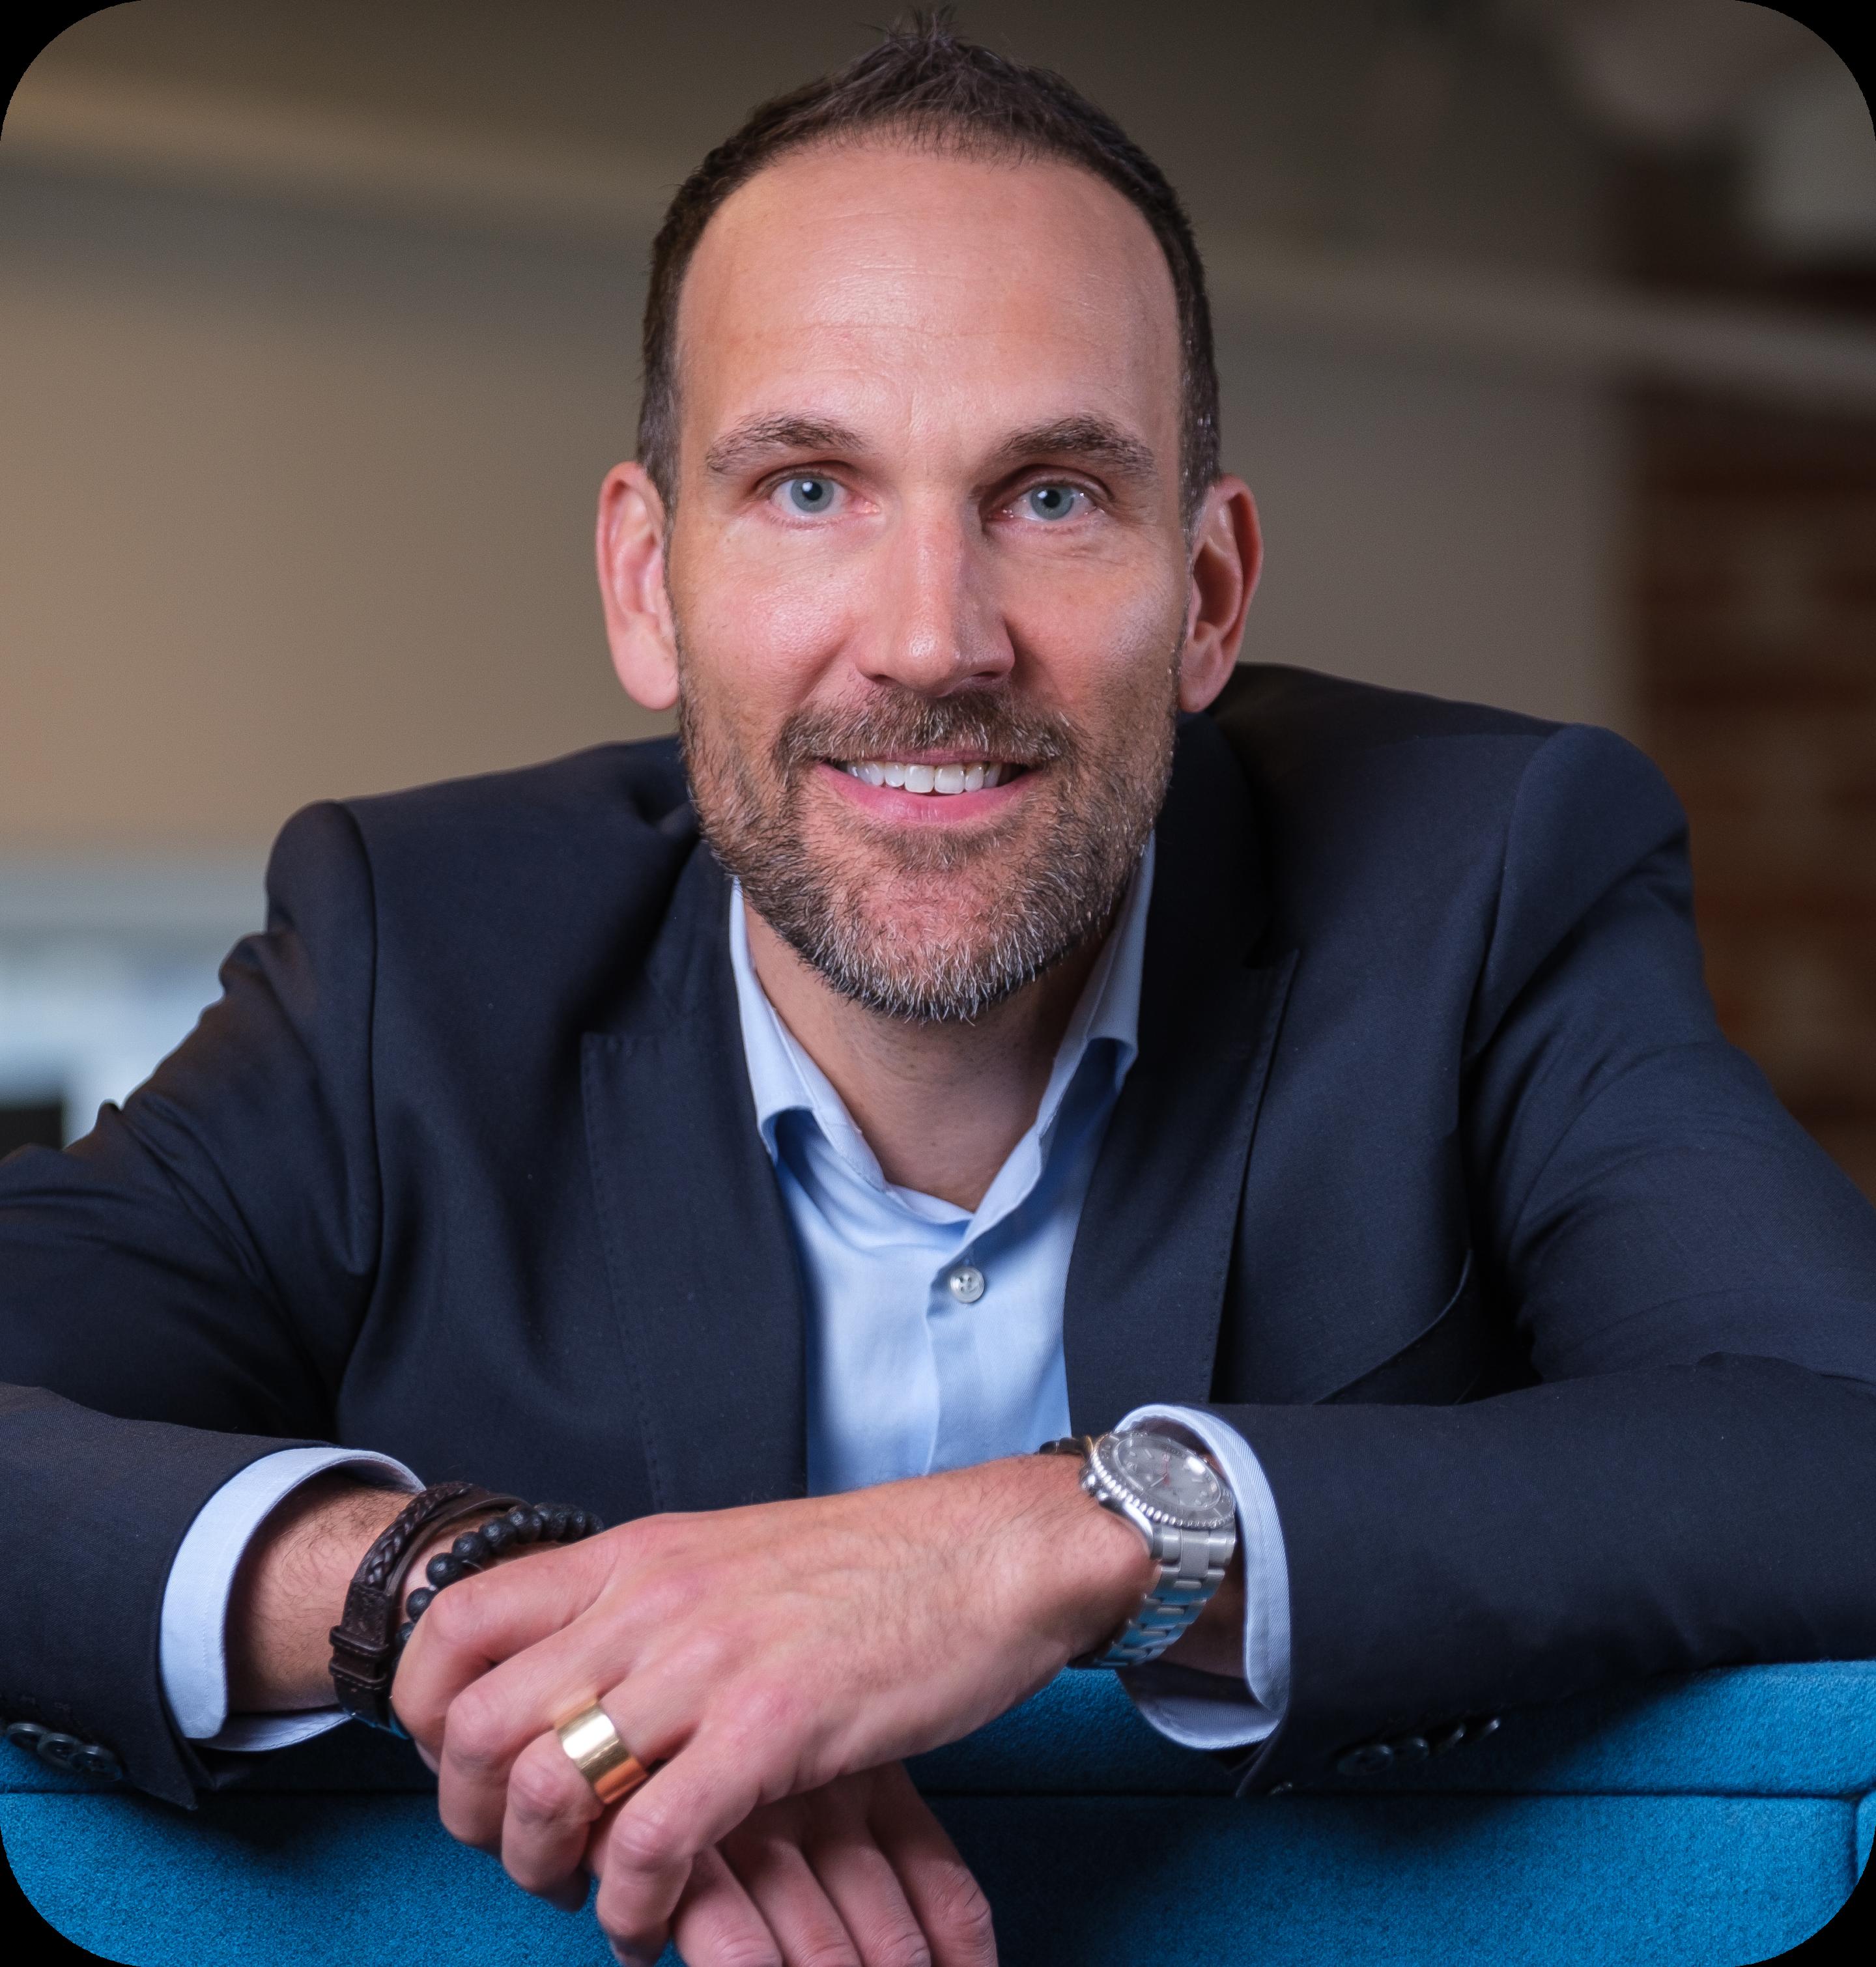 Mathias Dyberg, CEO at Elvenite